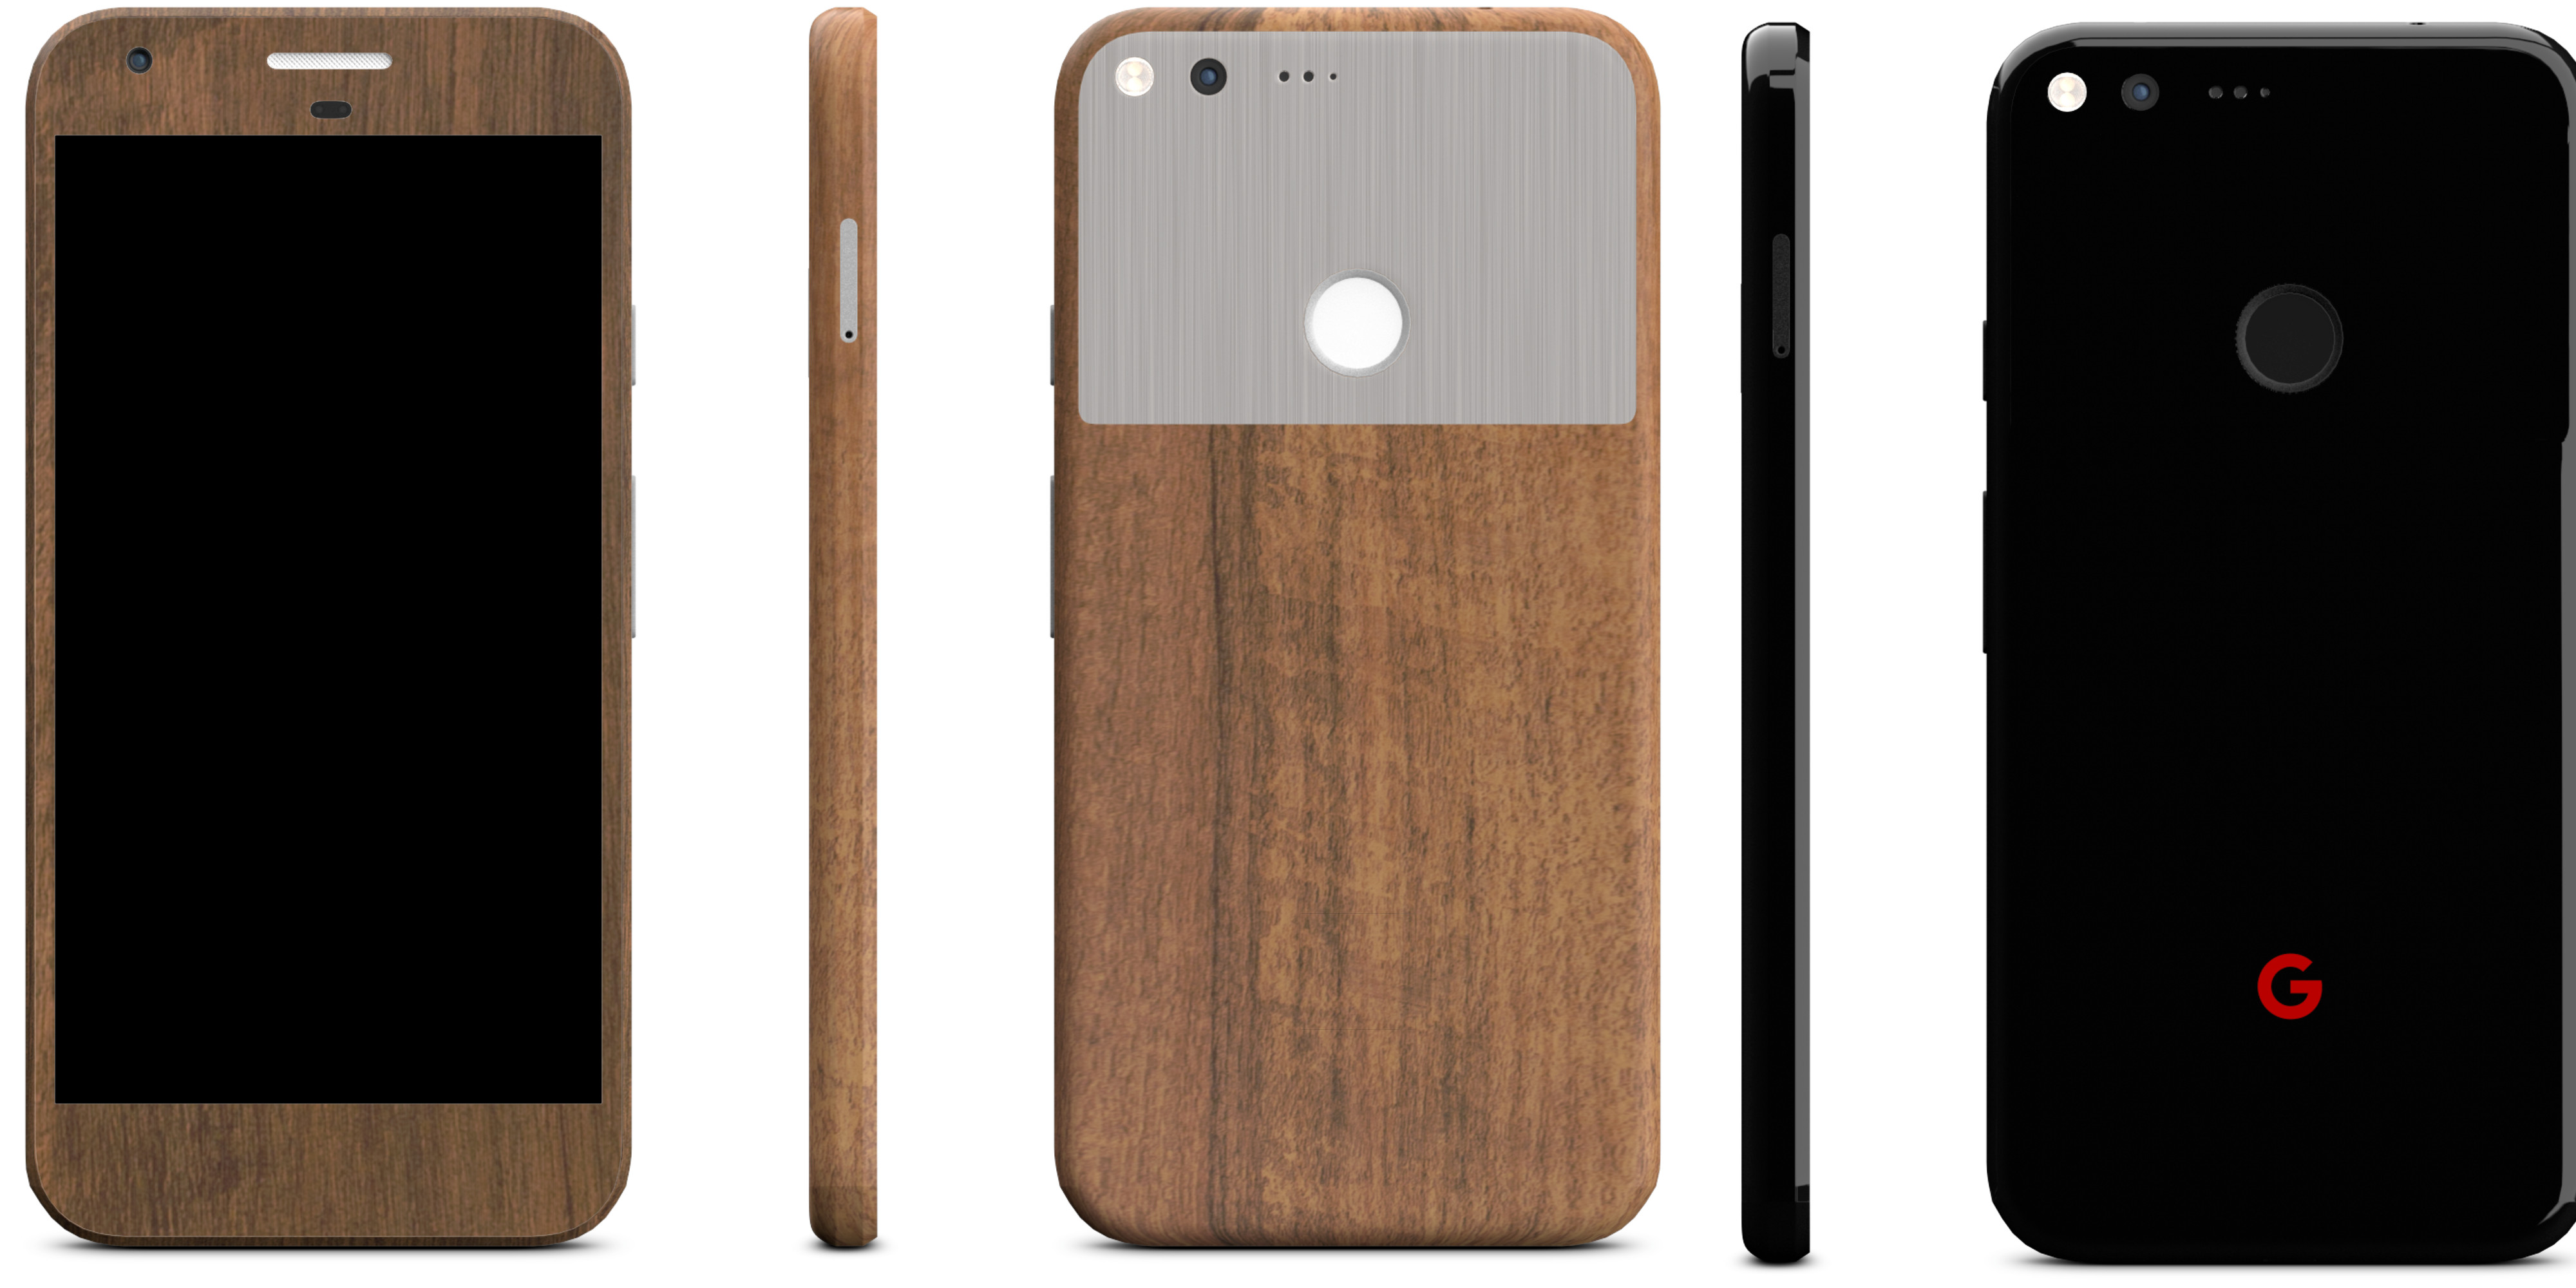 Colorware's leather/wood/more MacBook, iPhone, iPad & Google